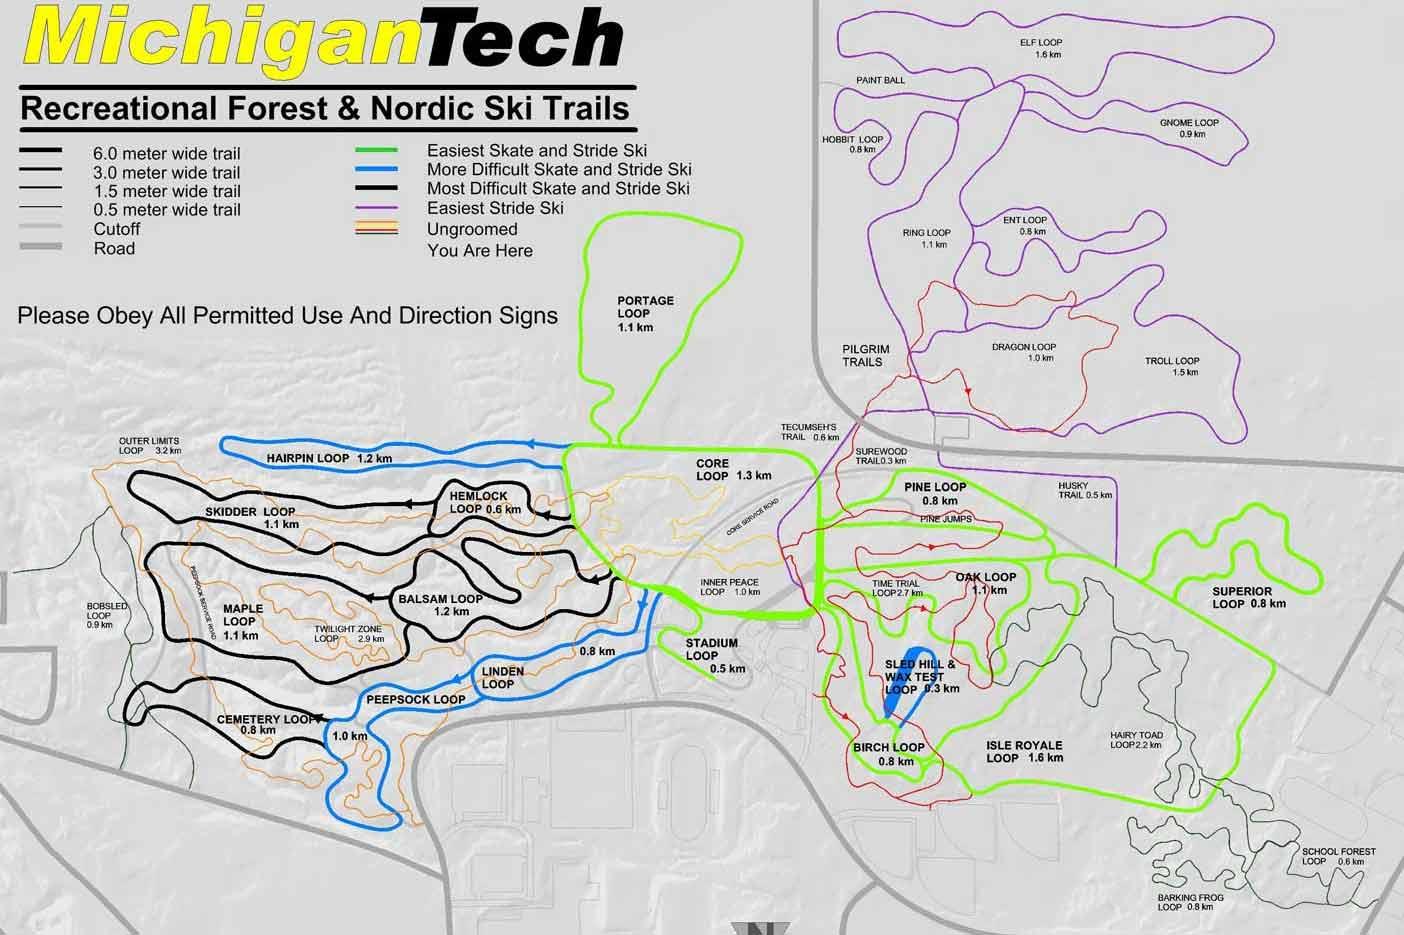 Ski In Michigan Map.Michigan Tech Nordic Ski Trails Trail Map Michigan Tech Nordic Ski